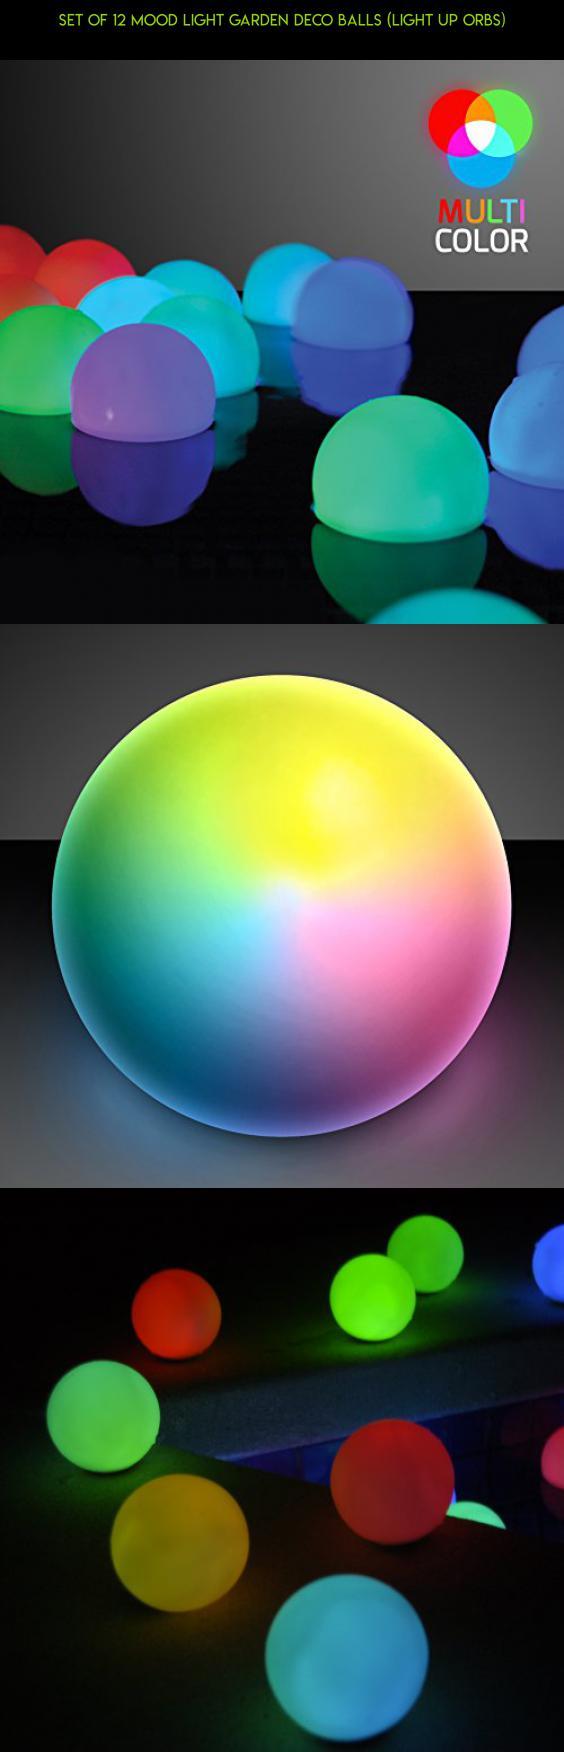 outdoor lighting balls. Set Of 12 Mood Light Garden Deco Balls (Light Up Orbs) #products # Outdoor Lighting